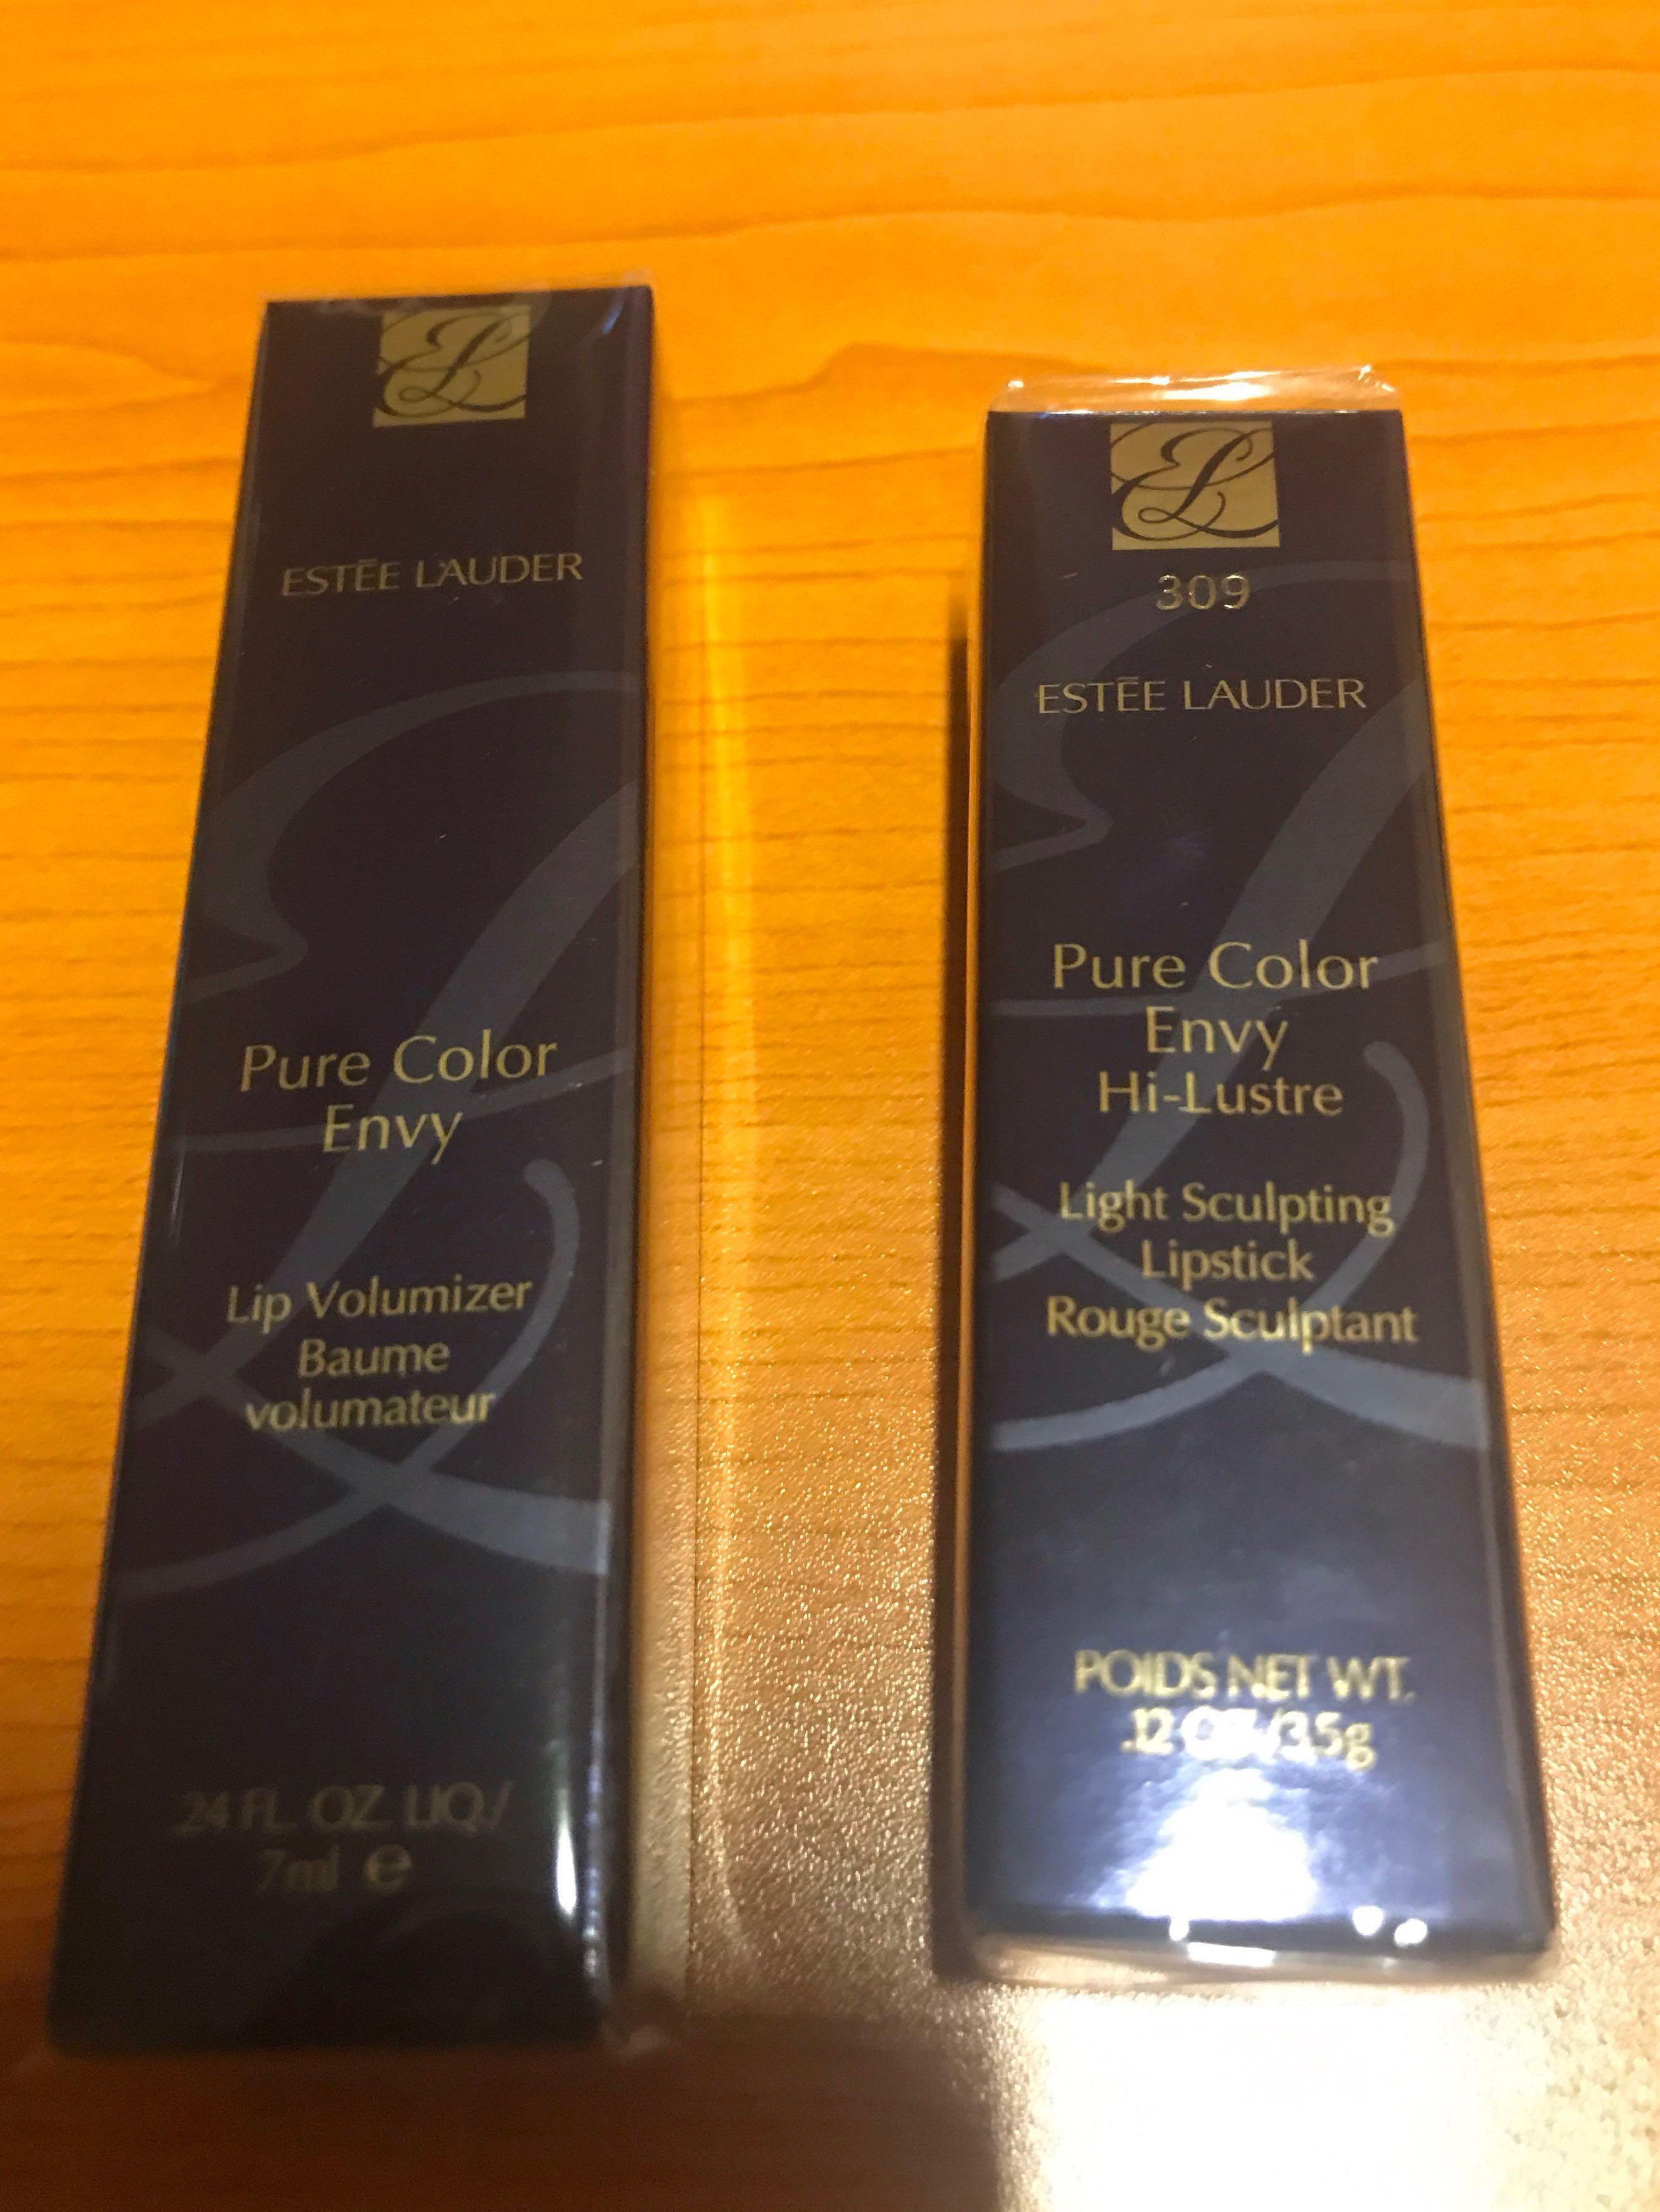 BN Sealed Estee Lauder Lipstick and Lip Volumizer